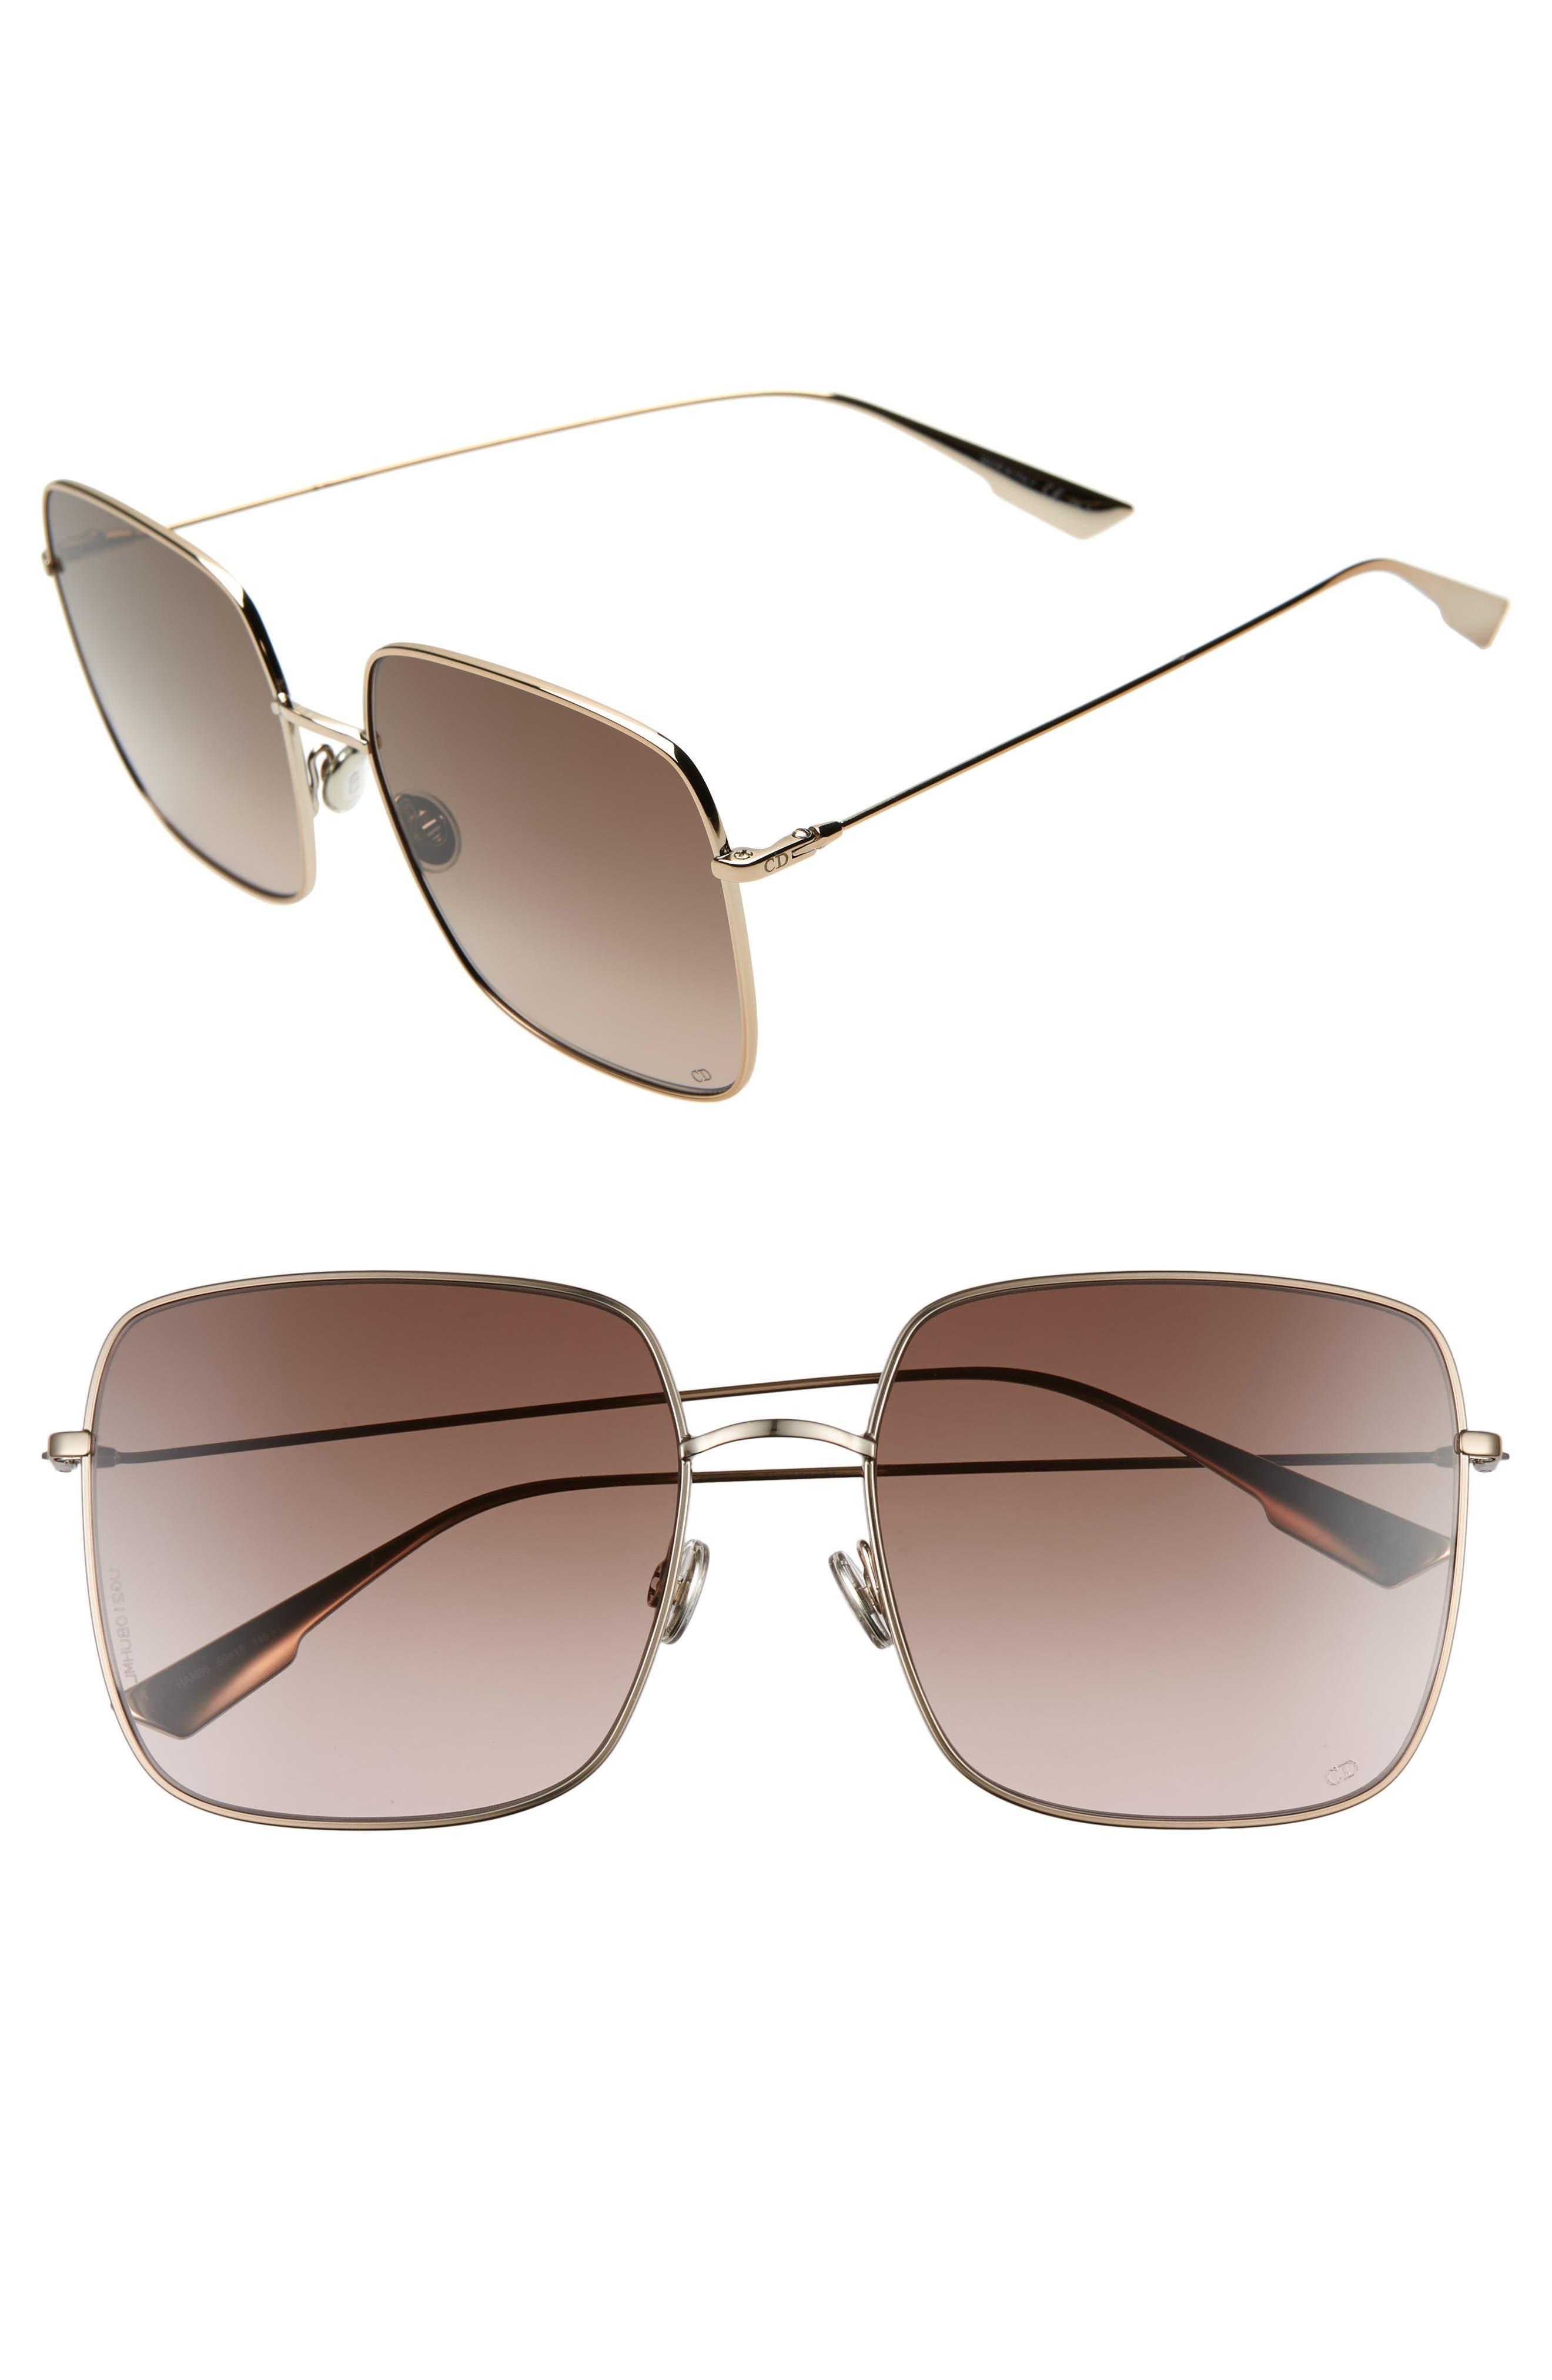 Stellaire 59mm Square Sunglasses,                             Main thumbnail 1, color,                             CHAMPAGNE